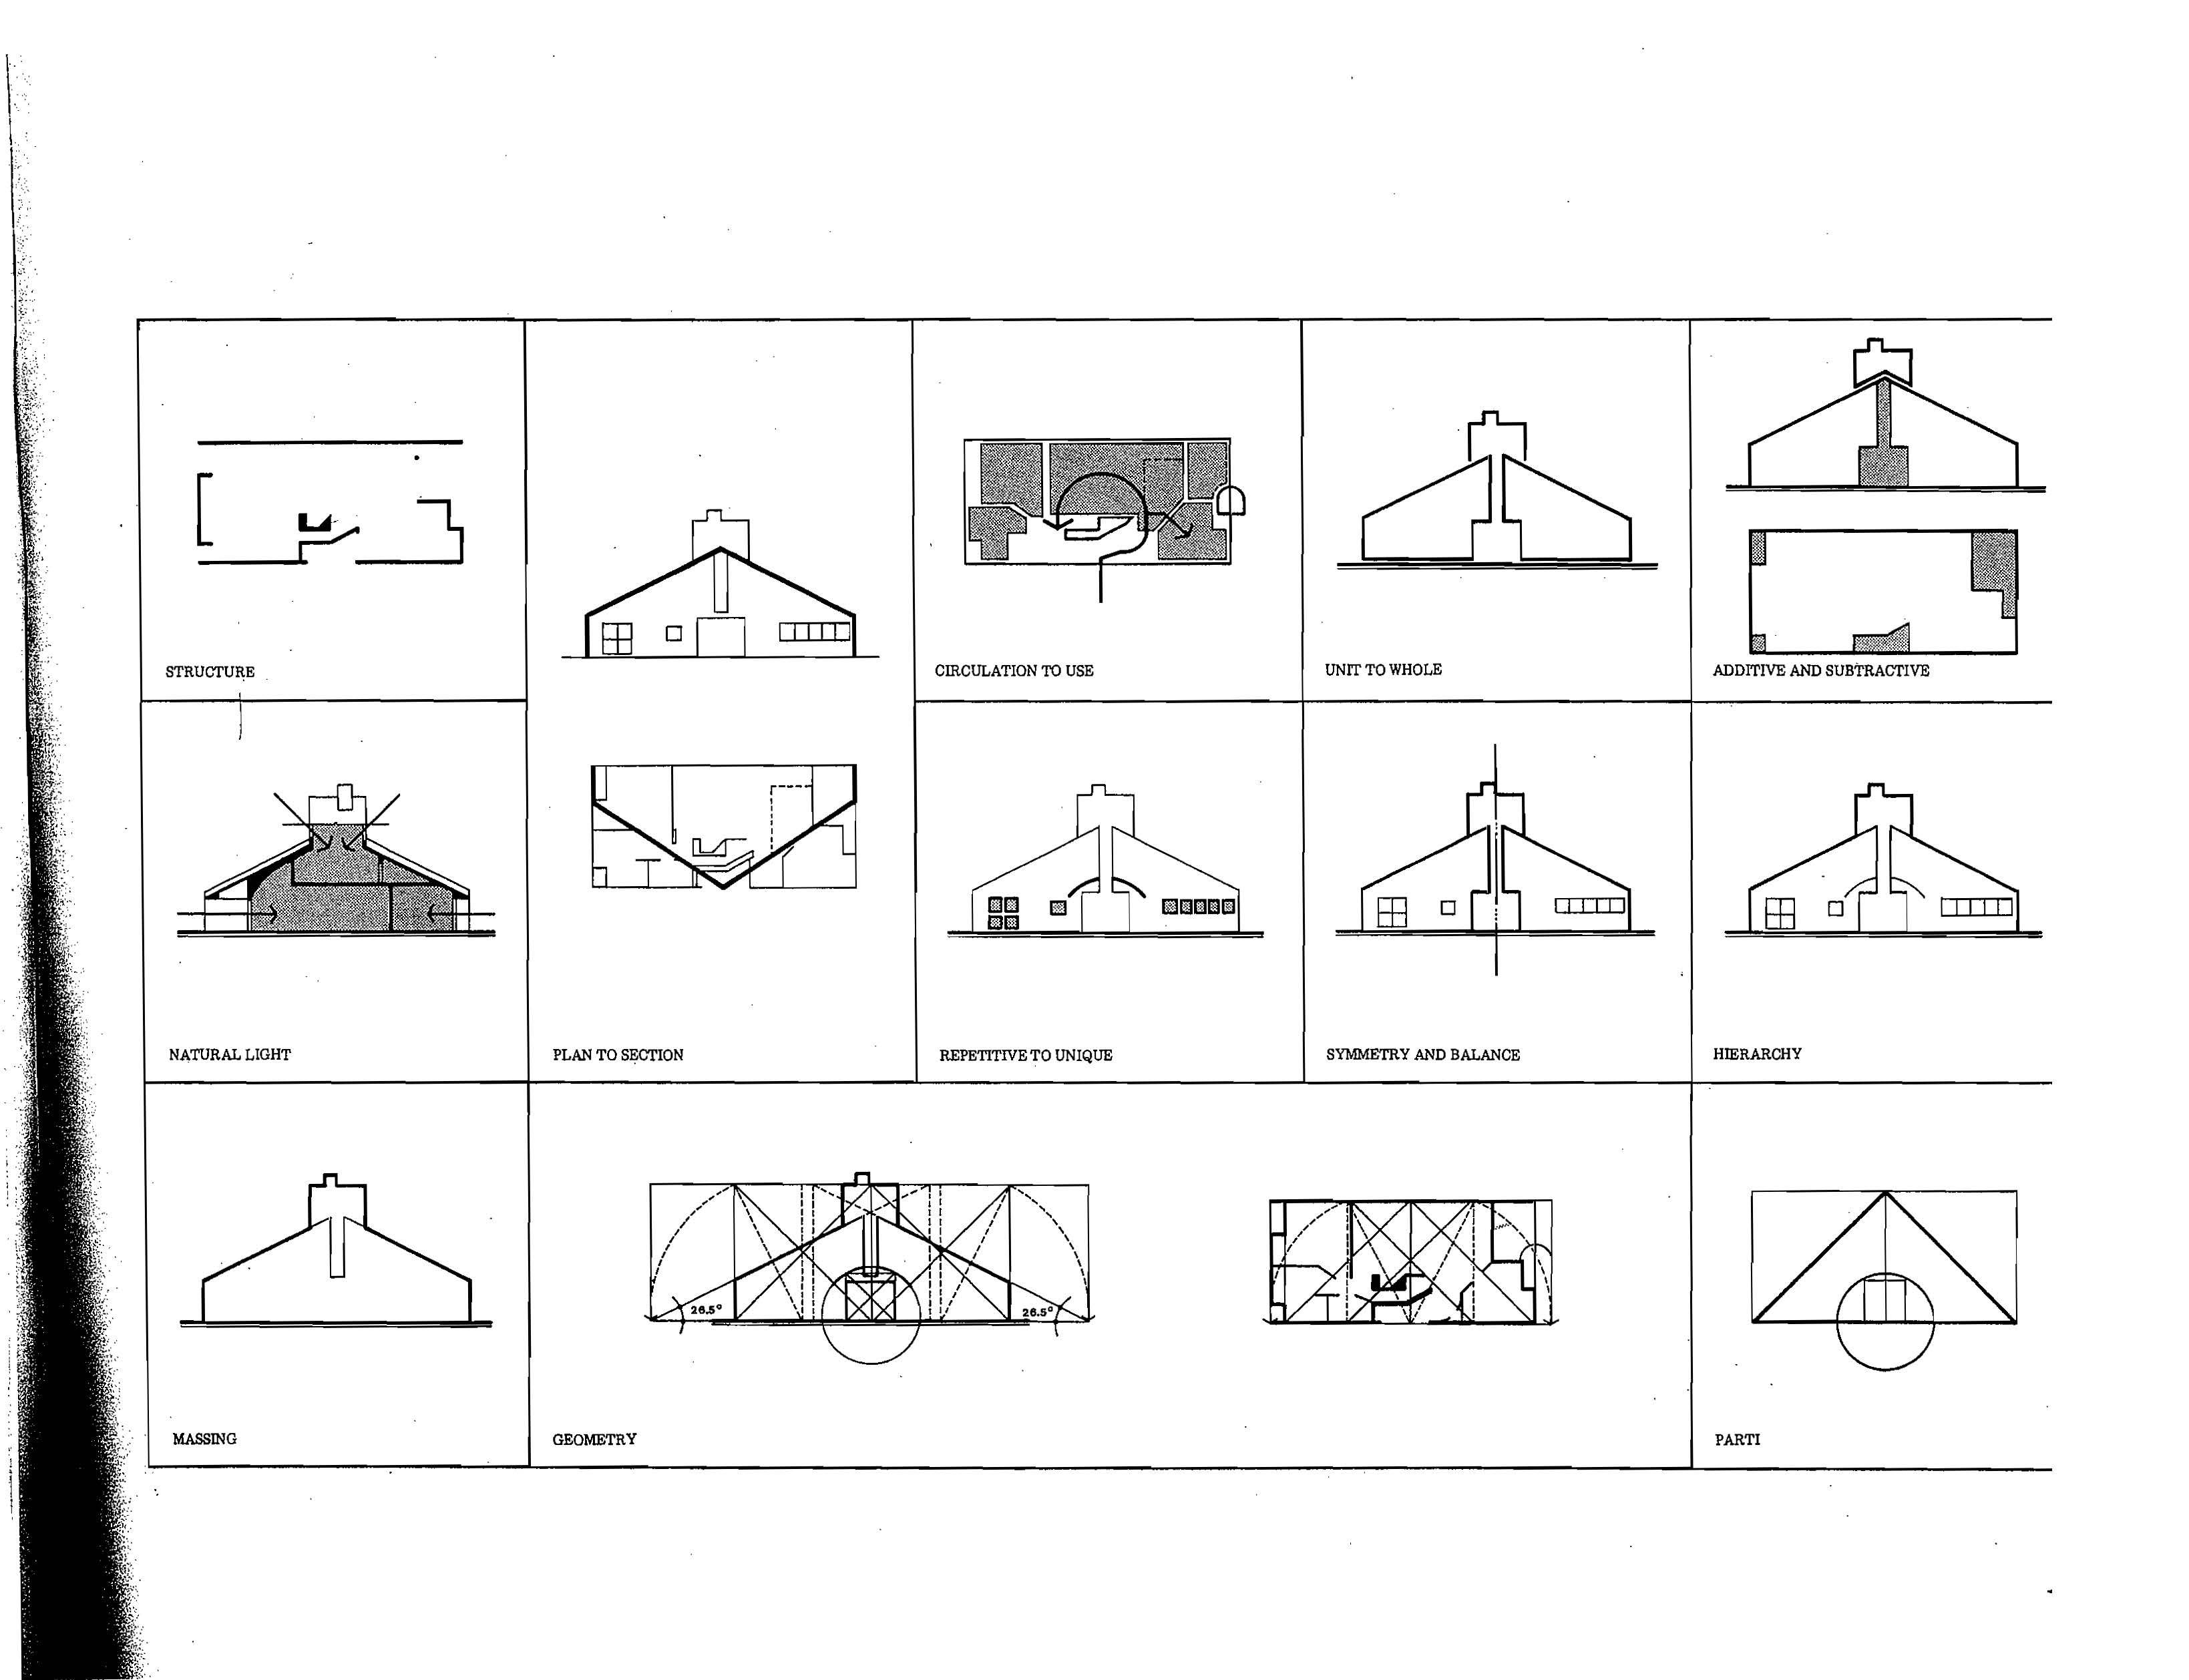 vanna venturi precedents in architecture [ 3278 x 2516 Pixel ]